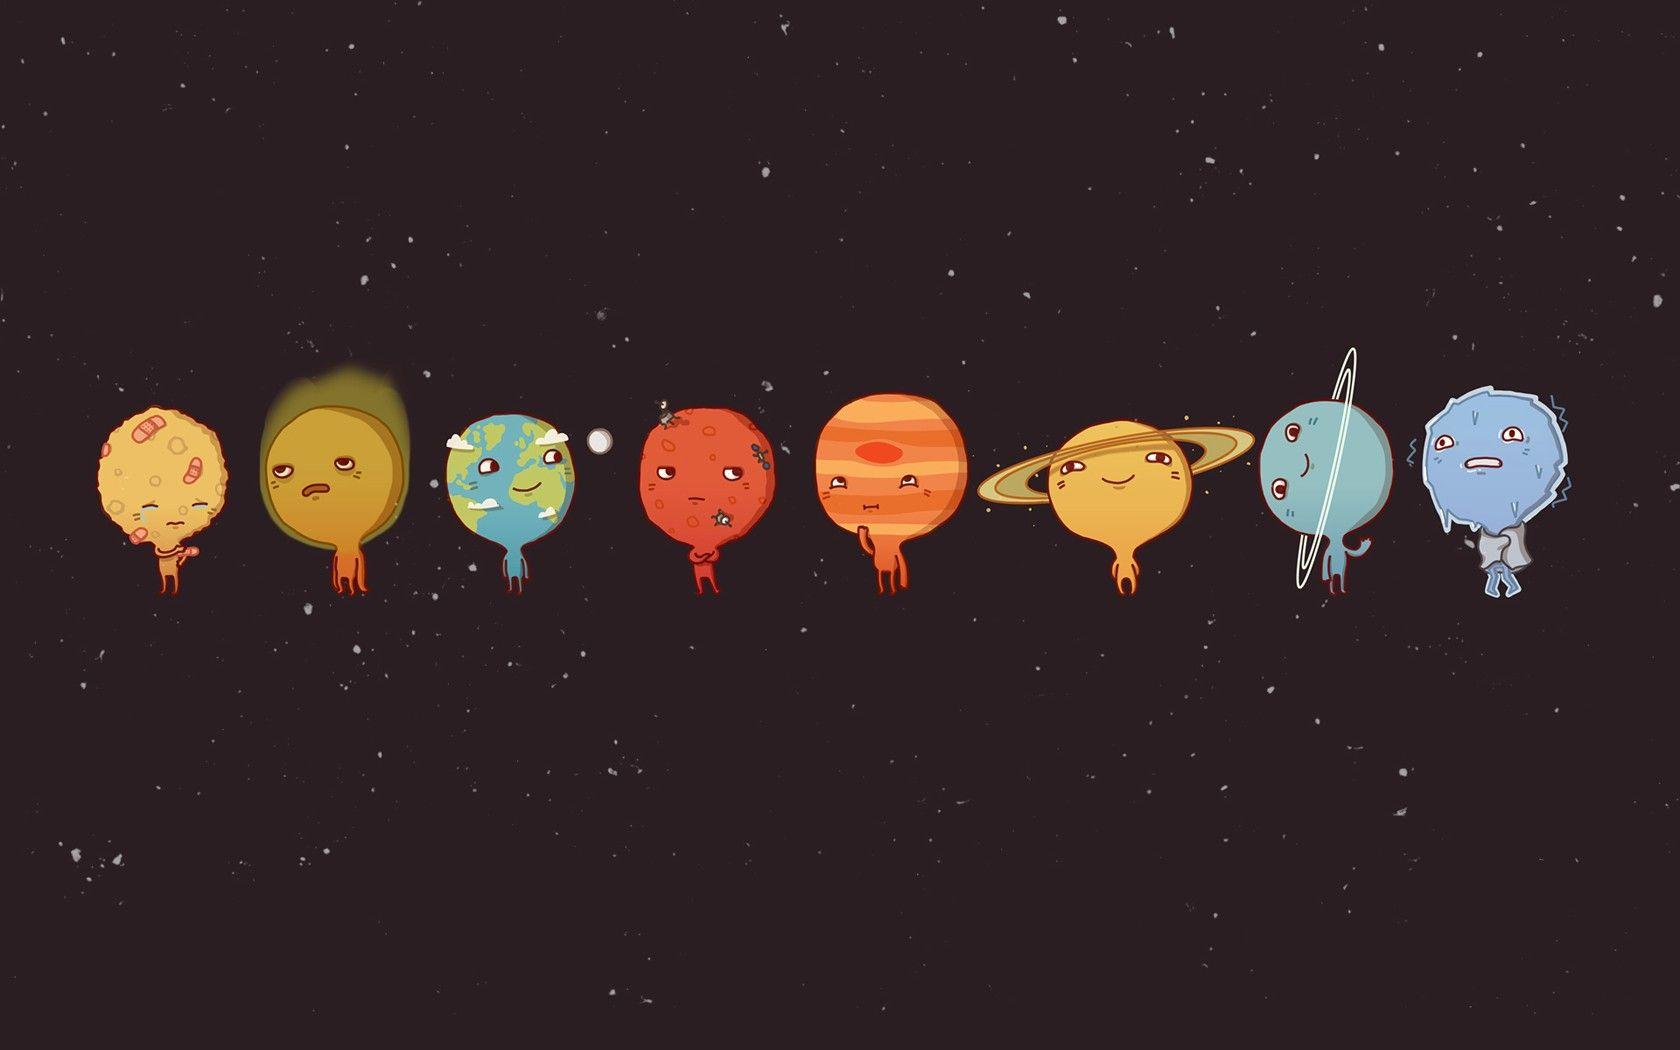 Space Art Digital Art Solar System Planet Humor Wallpaper Cute Wallpapers For Computer Desktop Wallpapers Tumblr Wallpaper Notebook